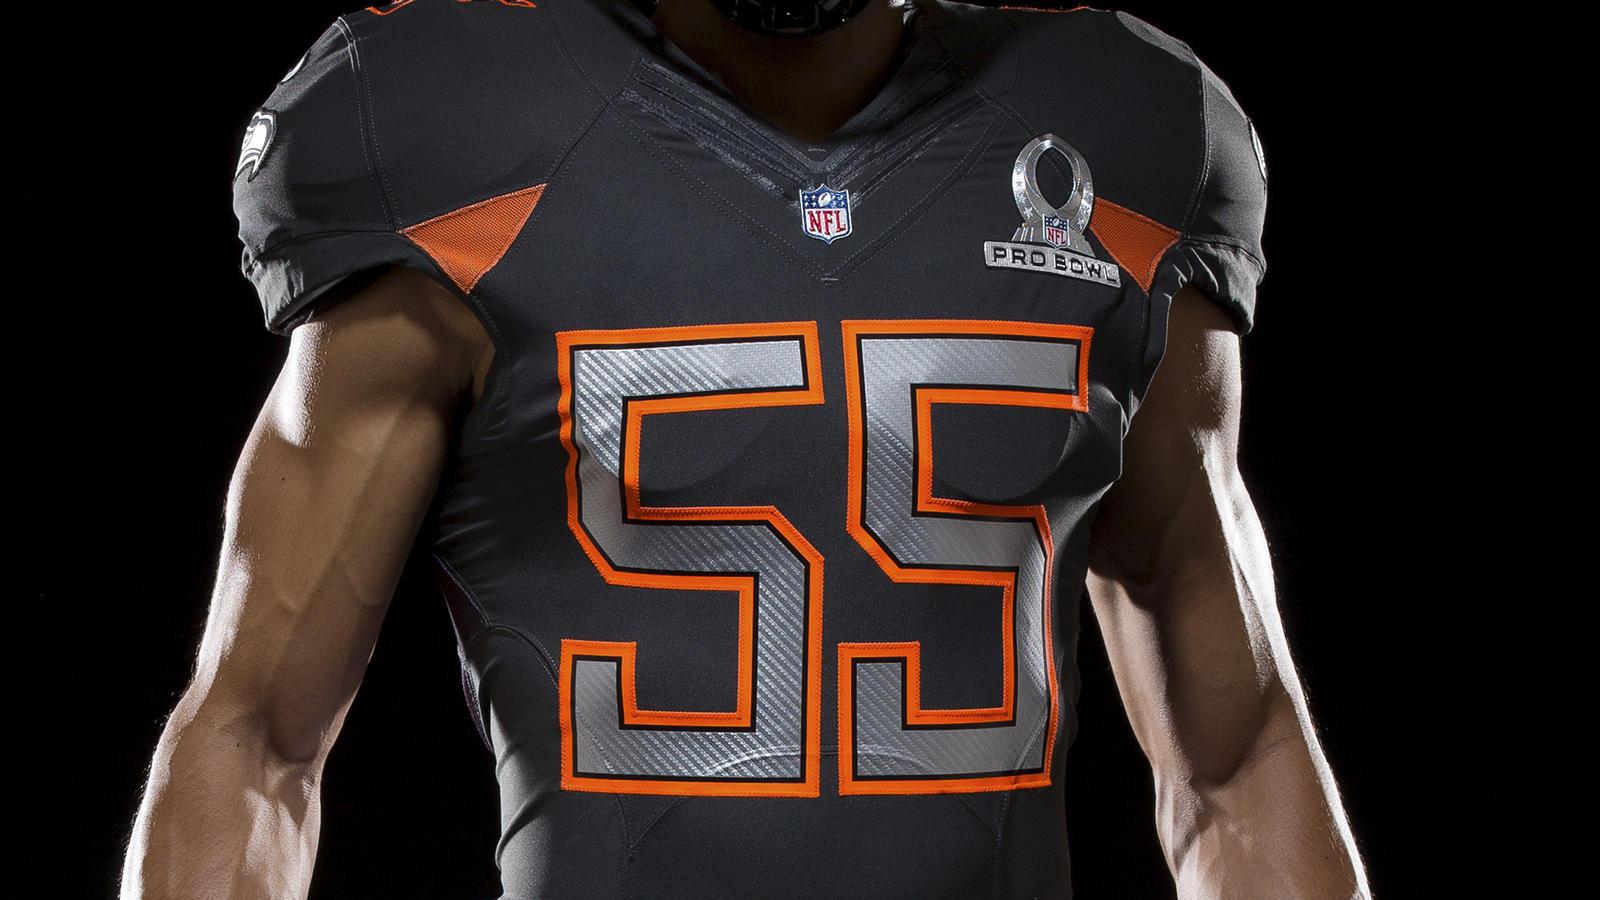 SP14_NFL_SB_TeamUni_NFC_4678_PR_crop_1